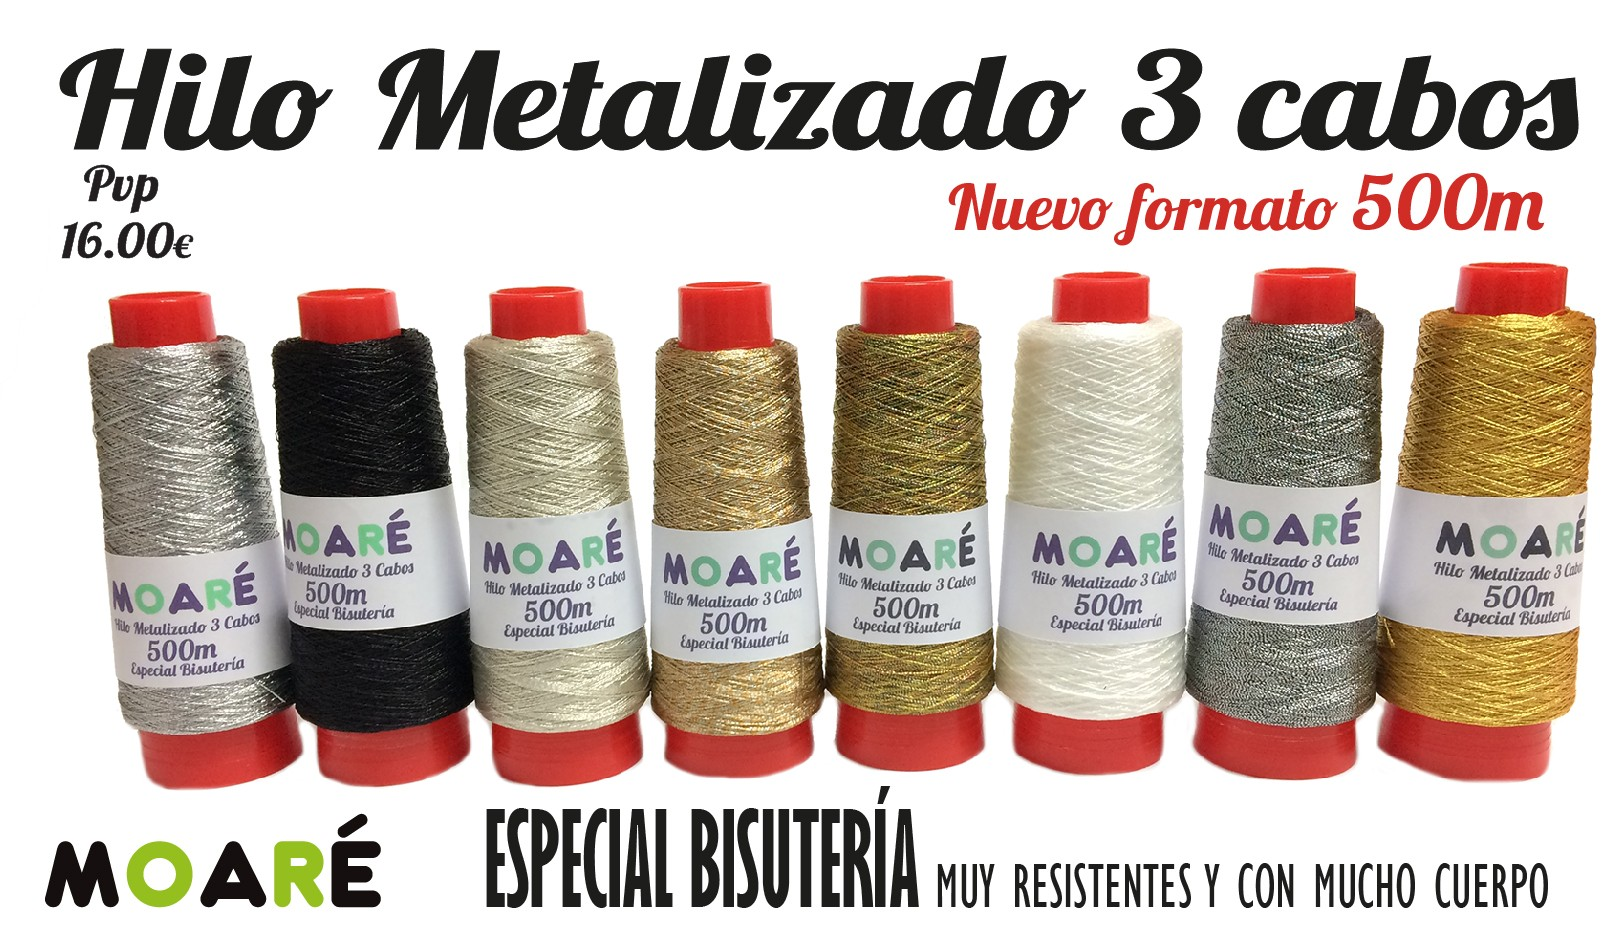 hilo metalizado 3 cabos especial bisuteria encaje de bolillos